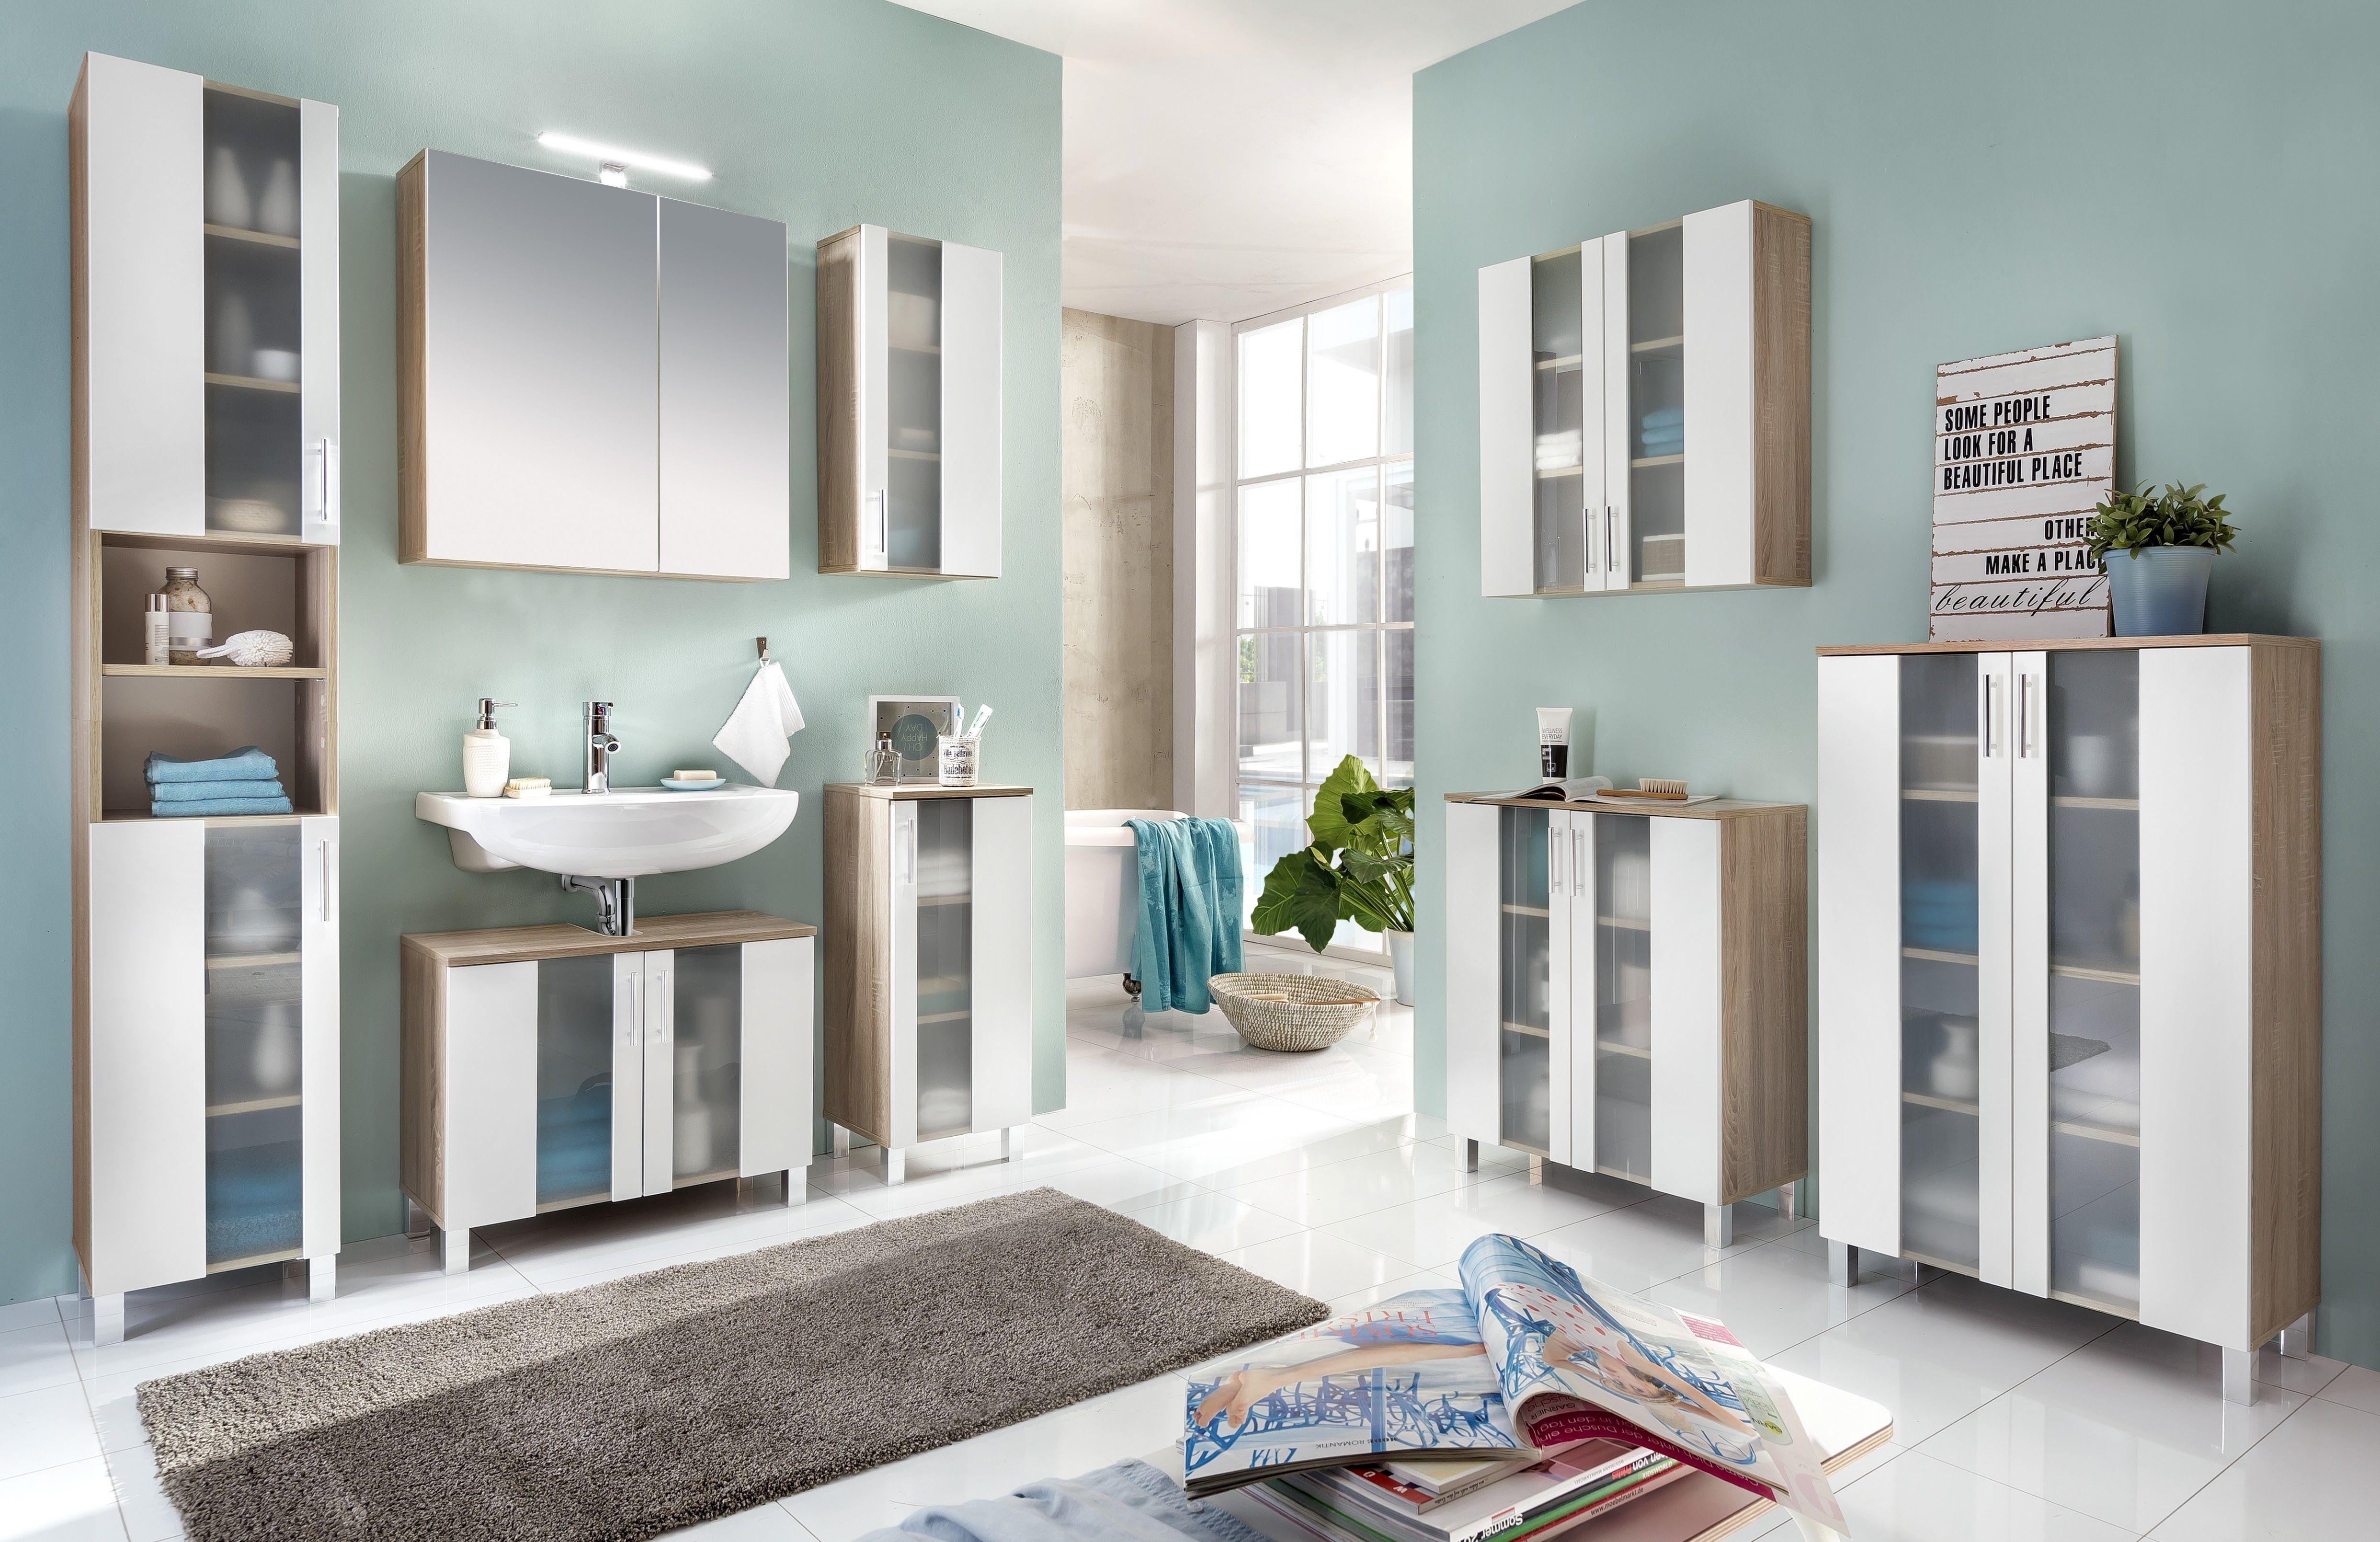 Badezimmer Set Weiss/ Eiche Sägerau Woody 93 01056 Holz Modern Jetzt  Bestellen Unter: